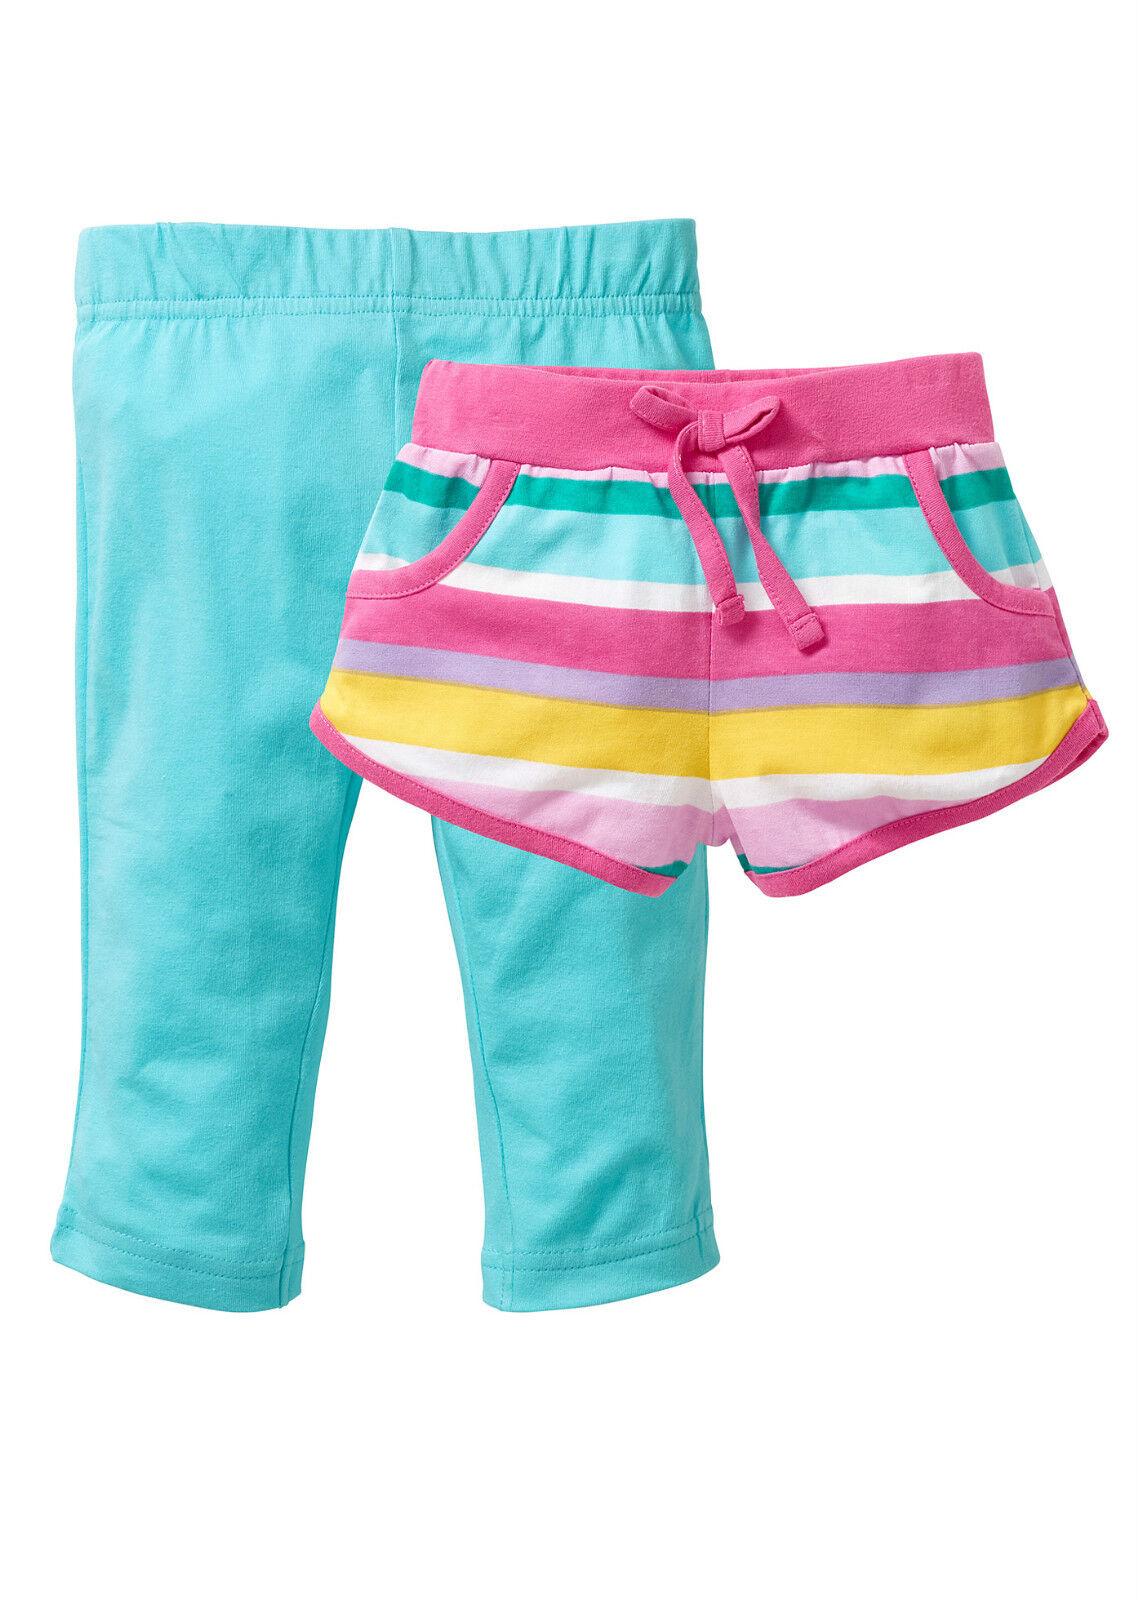 Online bestellen Ausverkauf Original wählen BPC Kinder Mädchen Shorts kurze Hose 3/4 Leggings Capri (2er-Pack) 964996